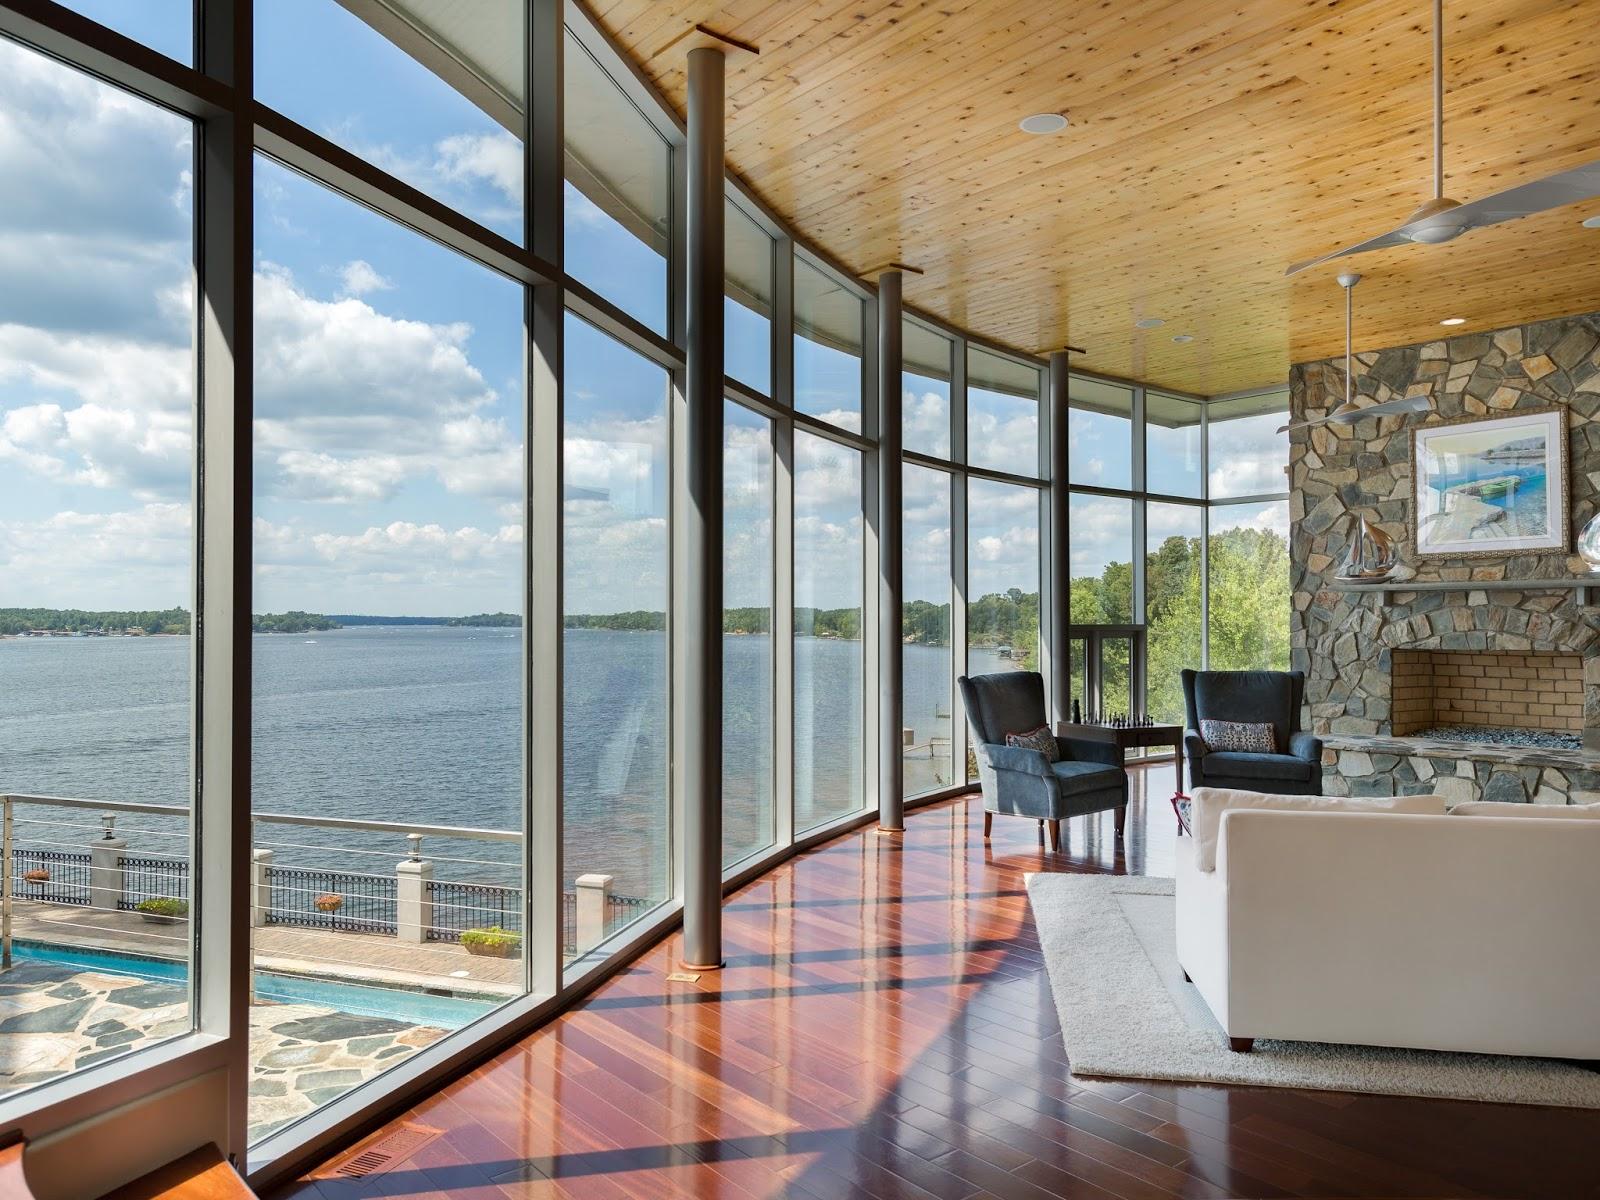 Charlotte Modern: Dive In .... Modern Living on Lake Wylie on